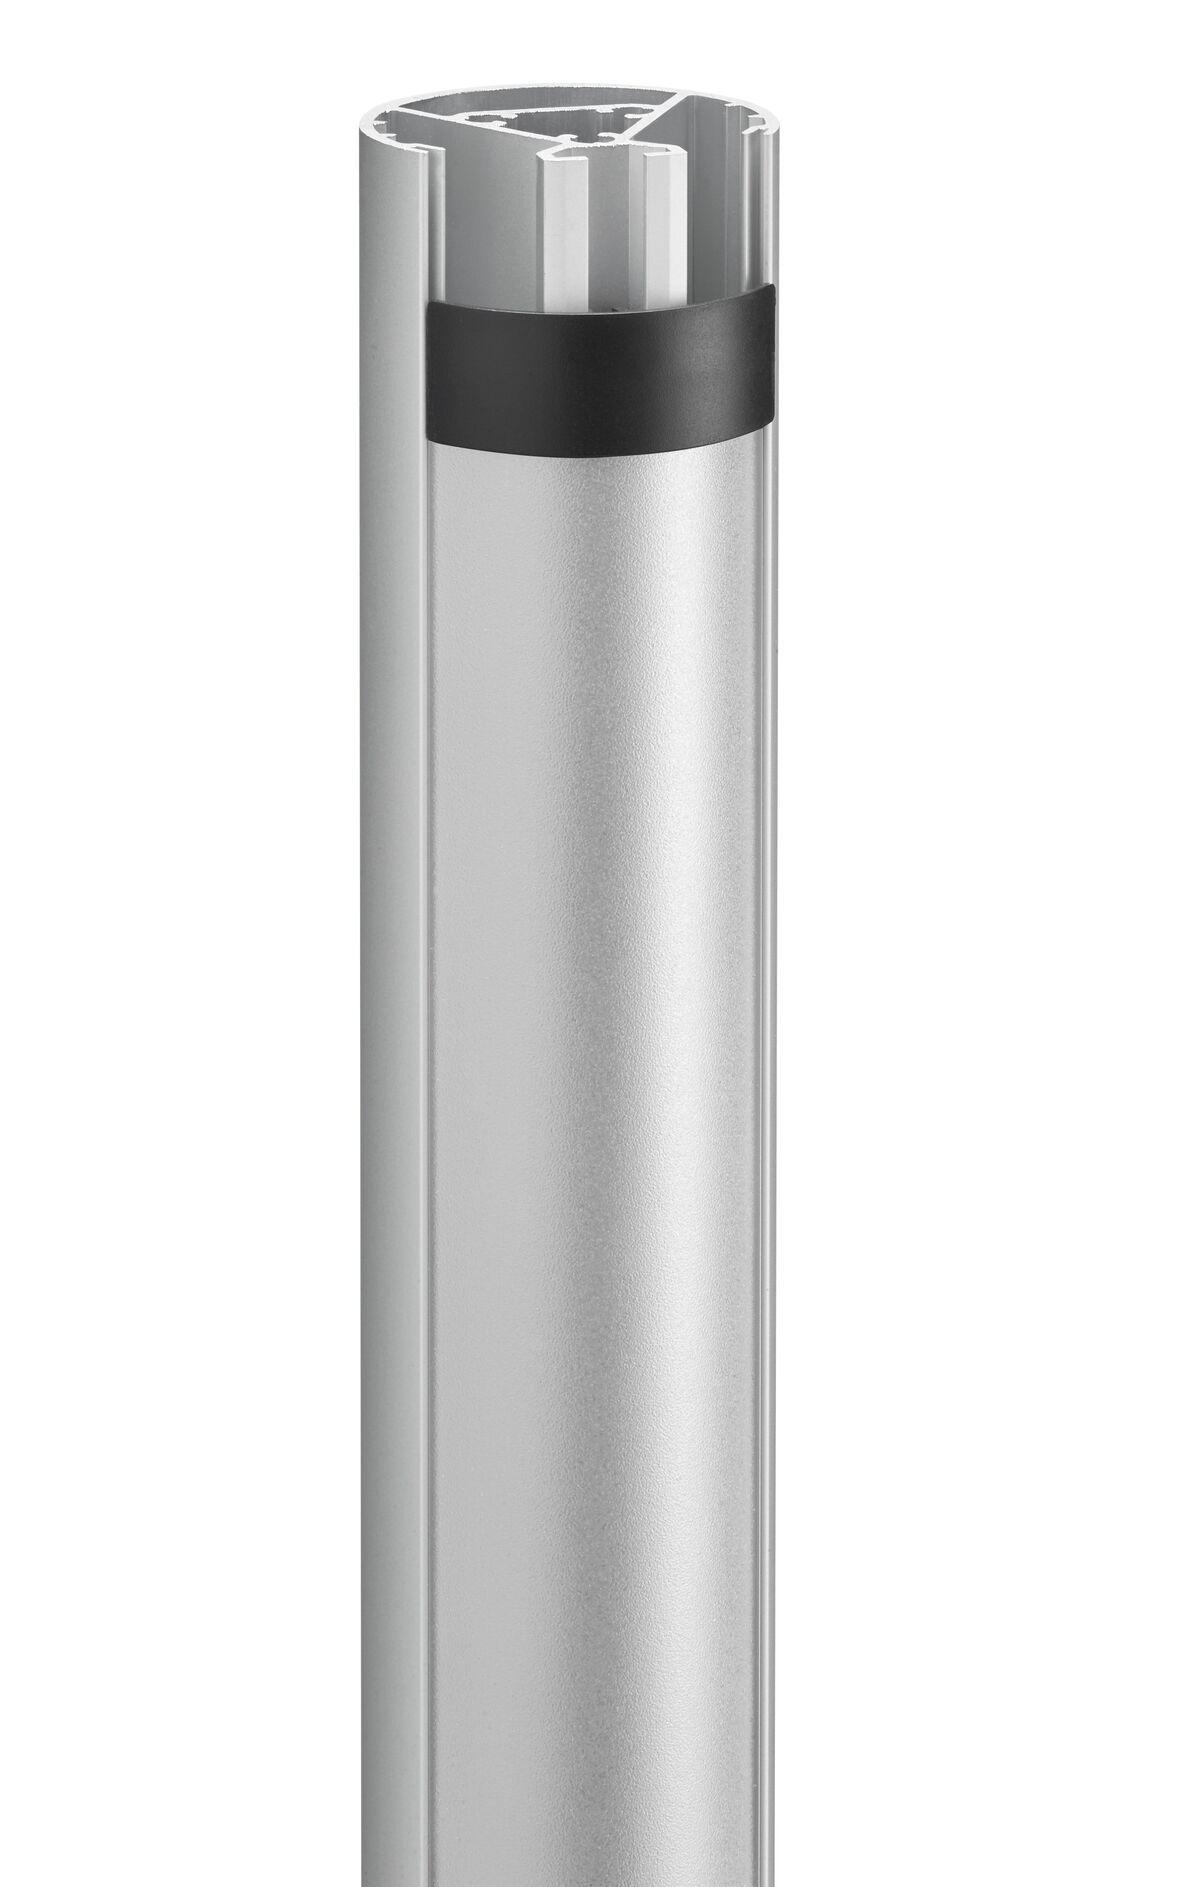 Vogel's PUC 2430 Tube 300 cm, silver - Detail